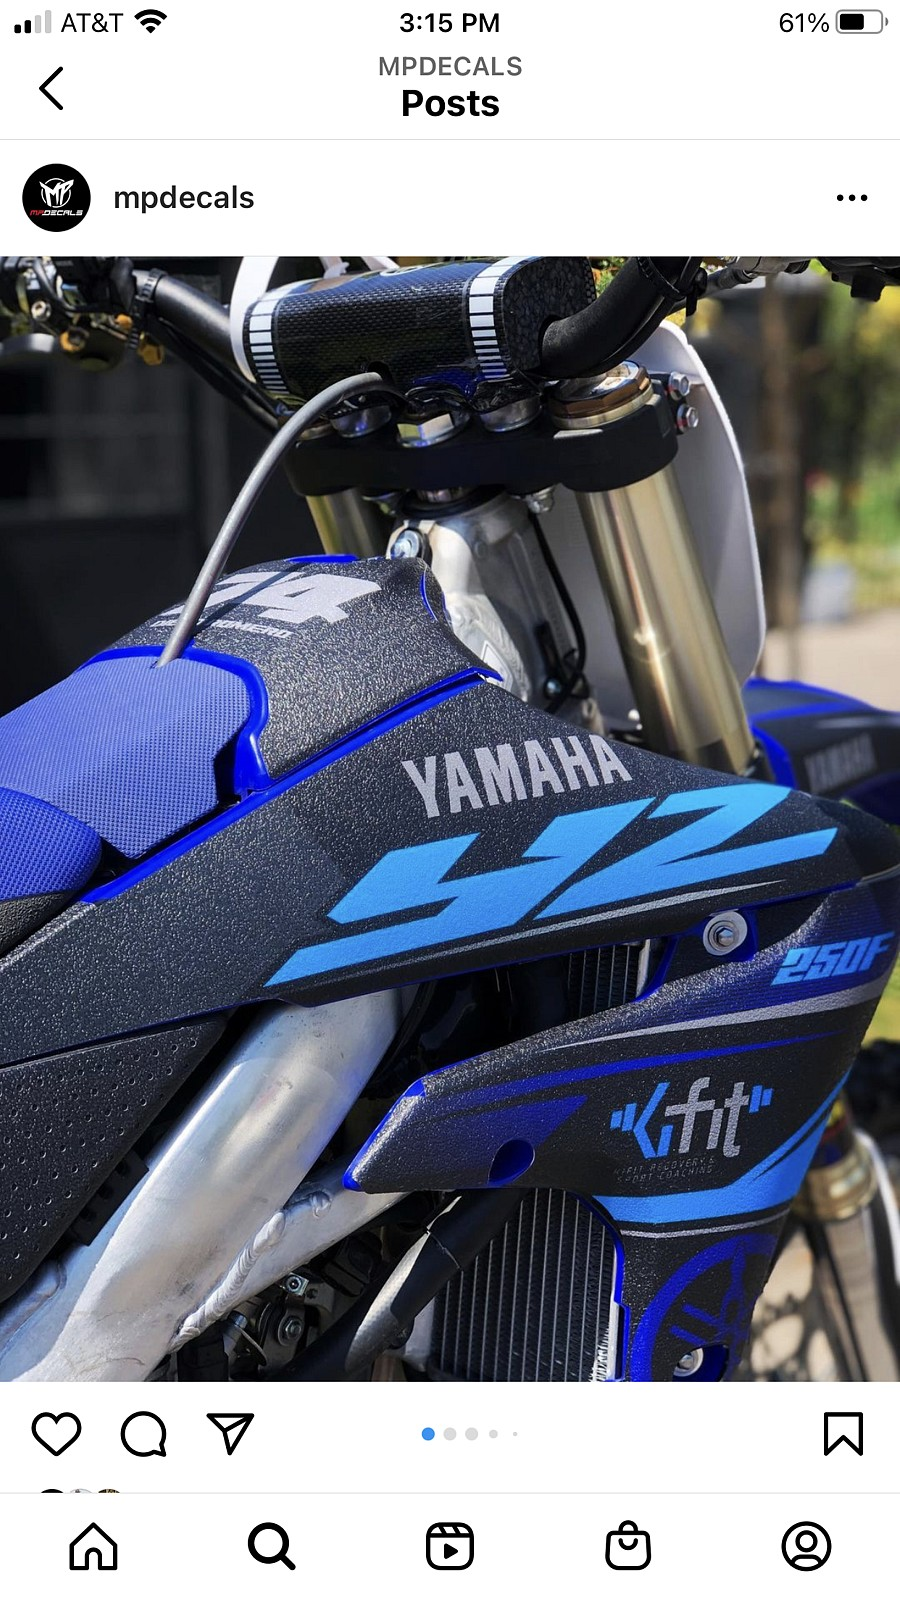 63504143-1B74-4FFE-99FC-4B15C1E17BDD - Marshall_Crabtree - Motocross Pictures - Vital MX